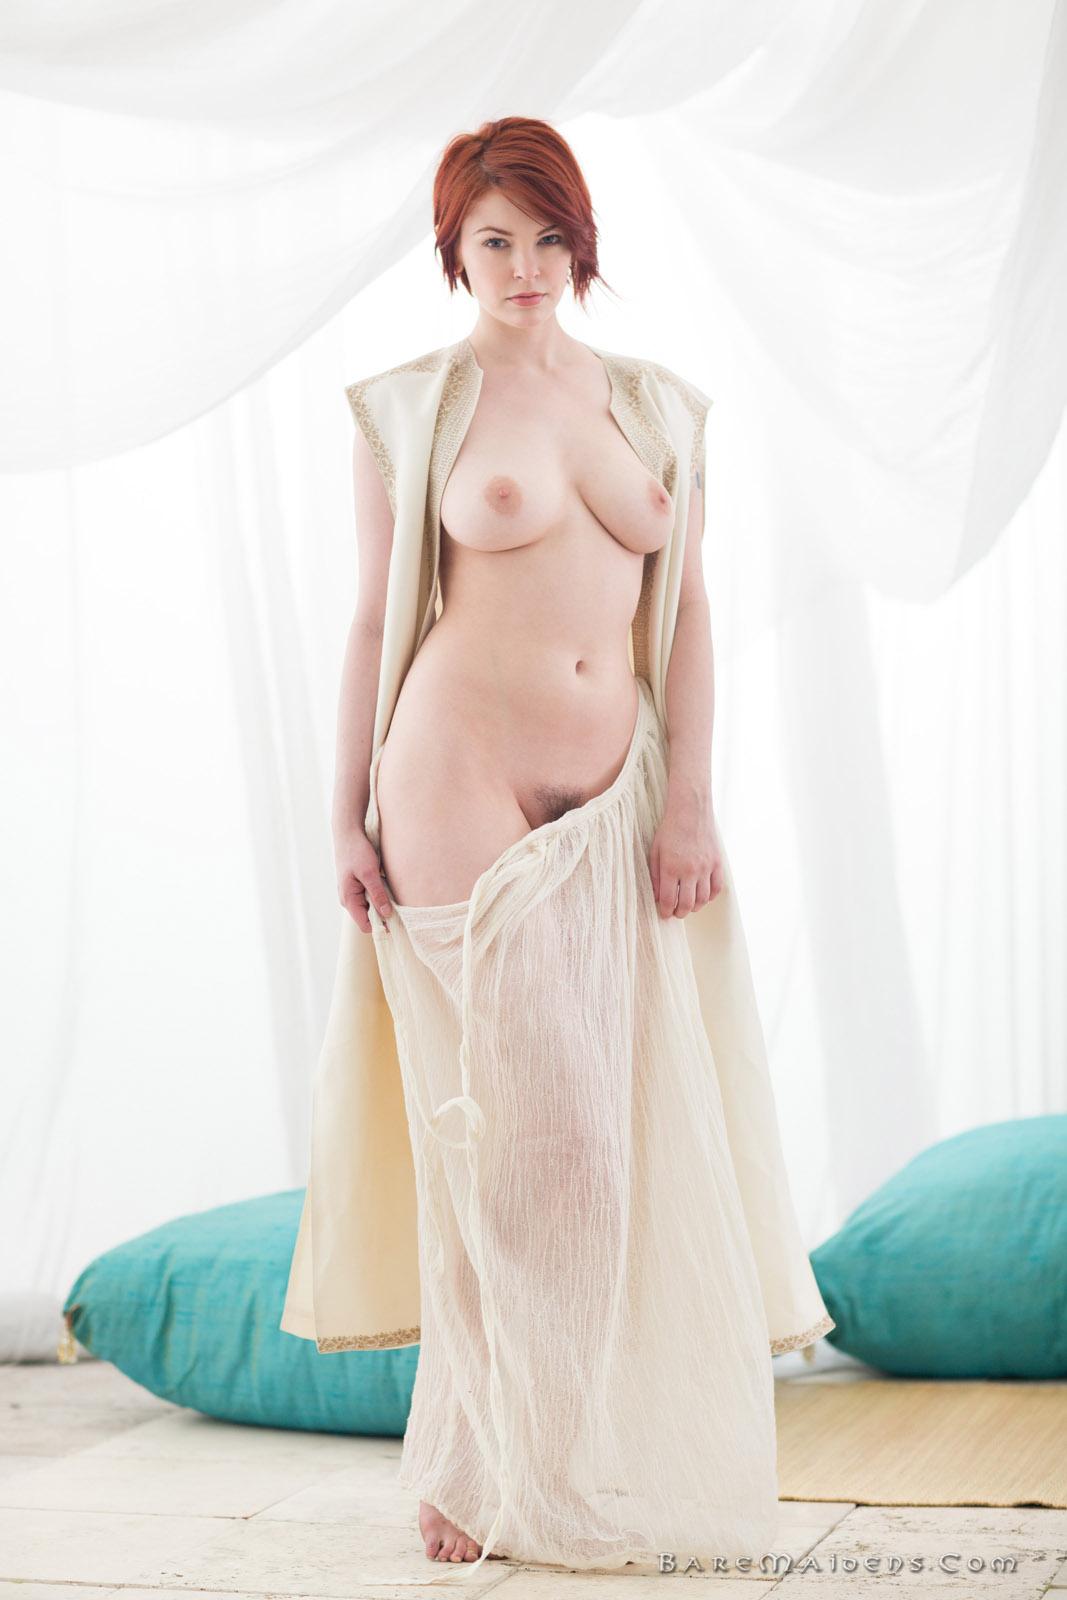 Big Tits Bare Maidens